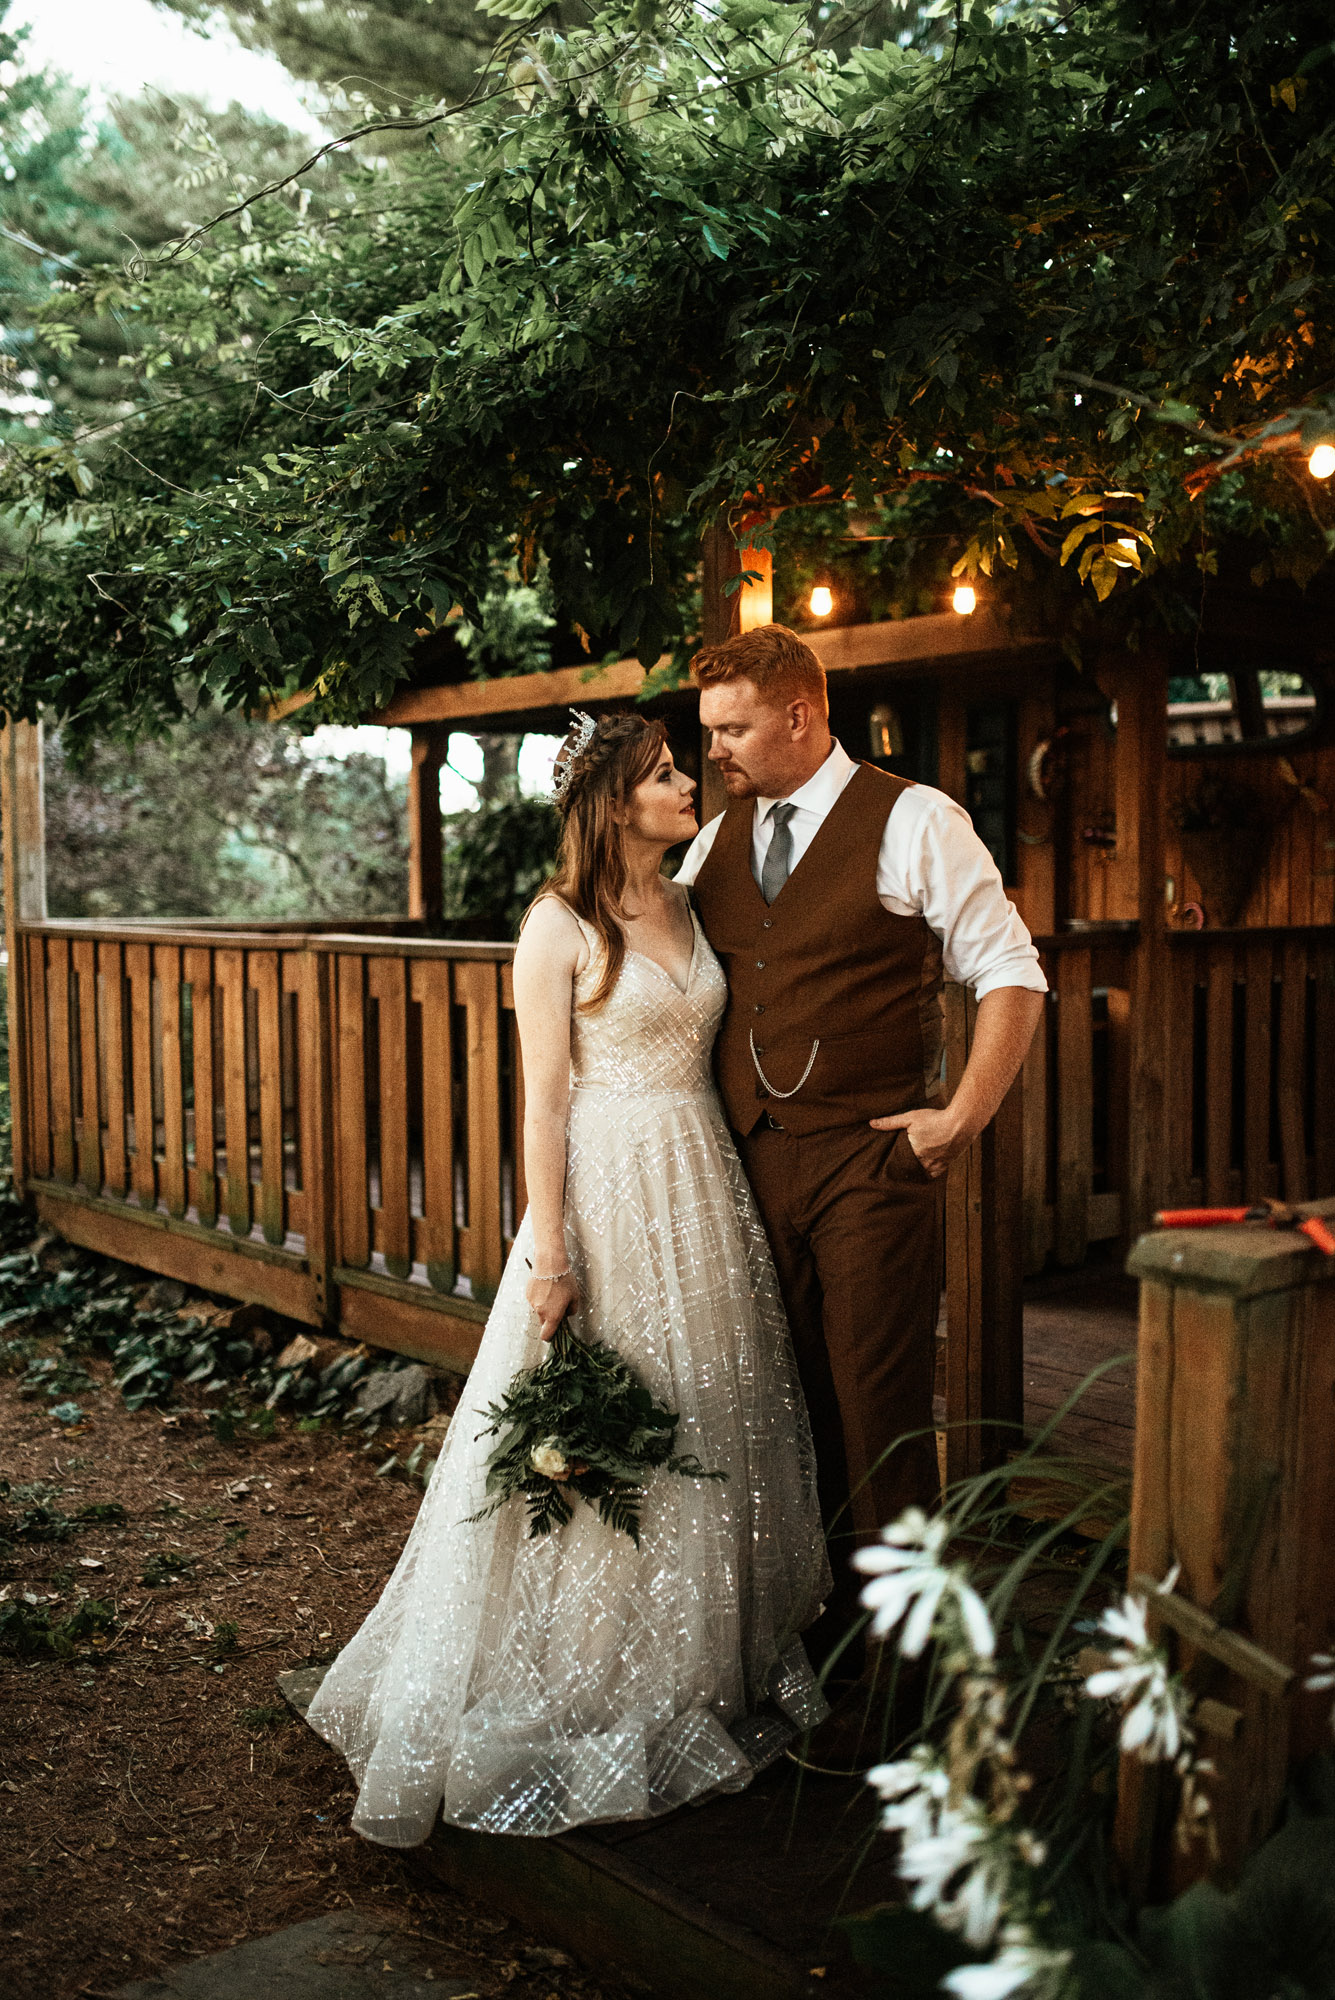 philadelphia_wedding_photographer_cochranville_pennsylvania_country_brey_photo_backyard_new_jersey_maryland